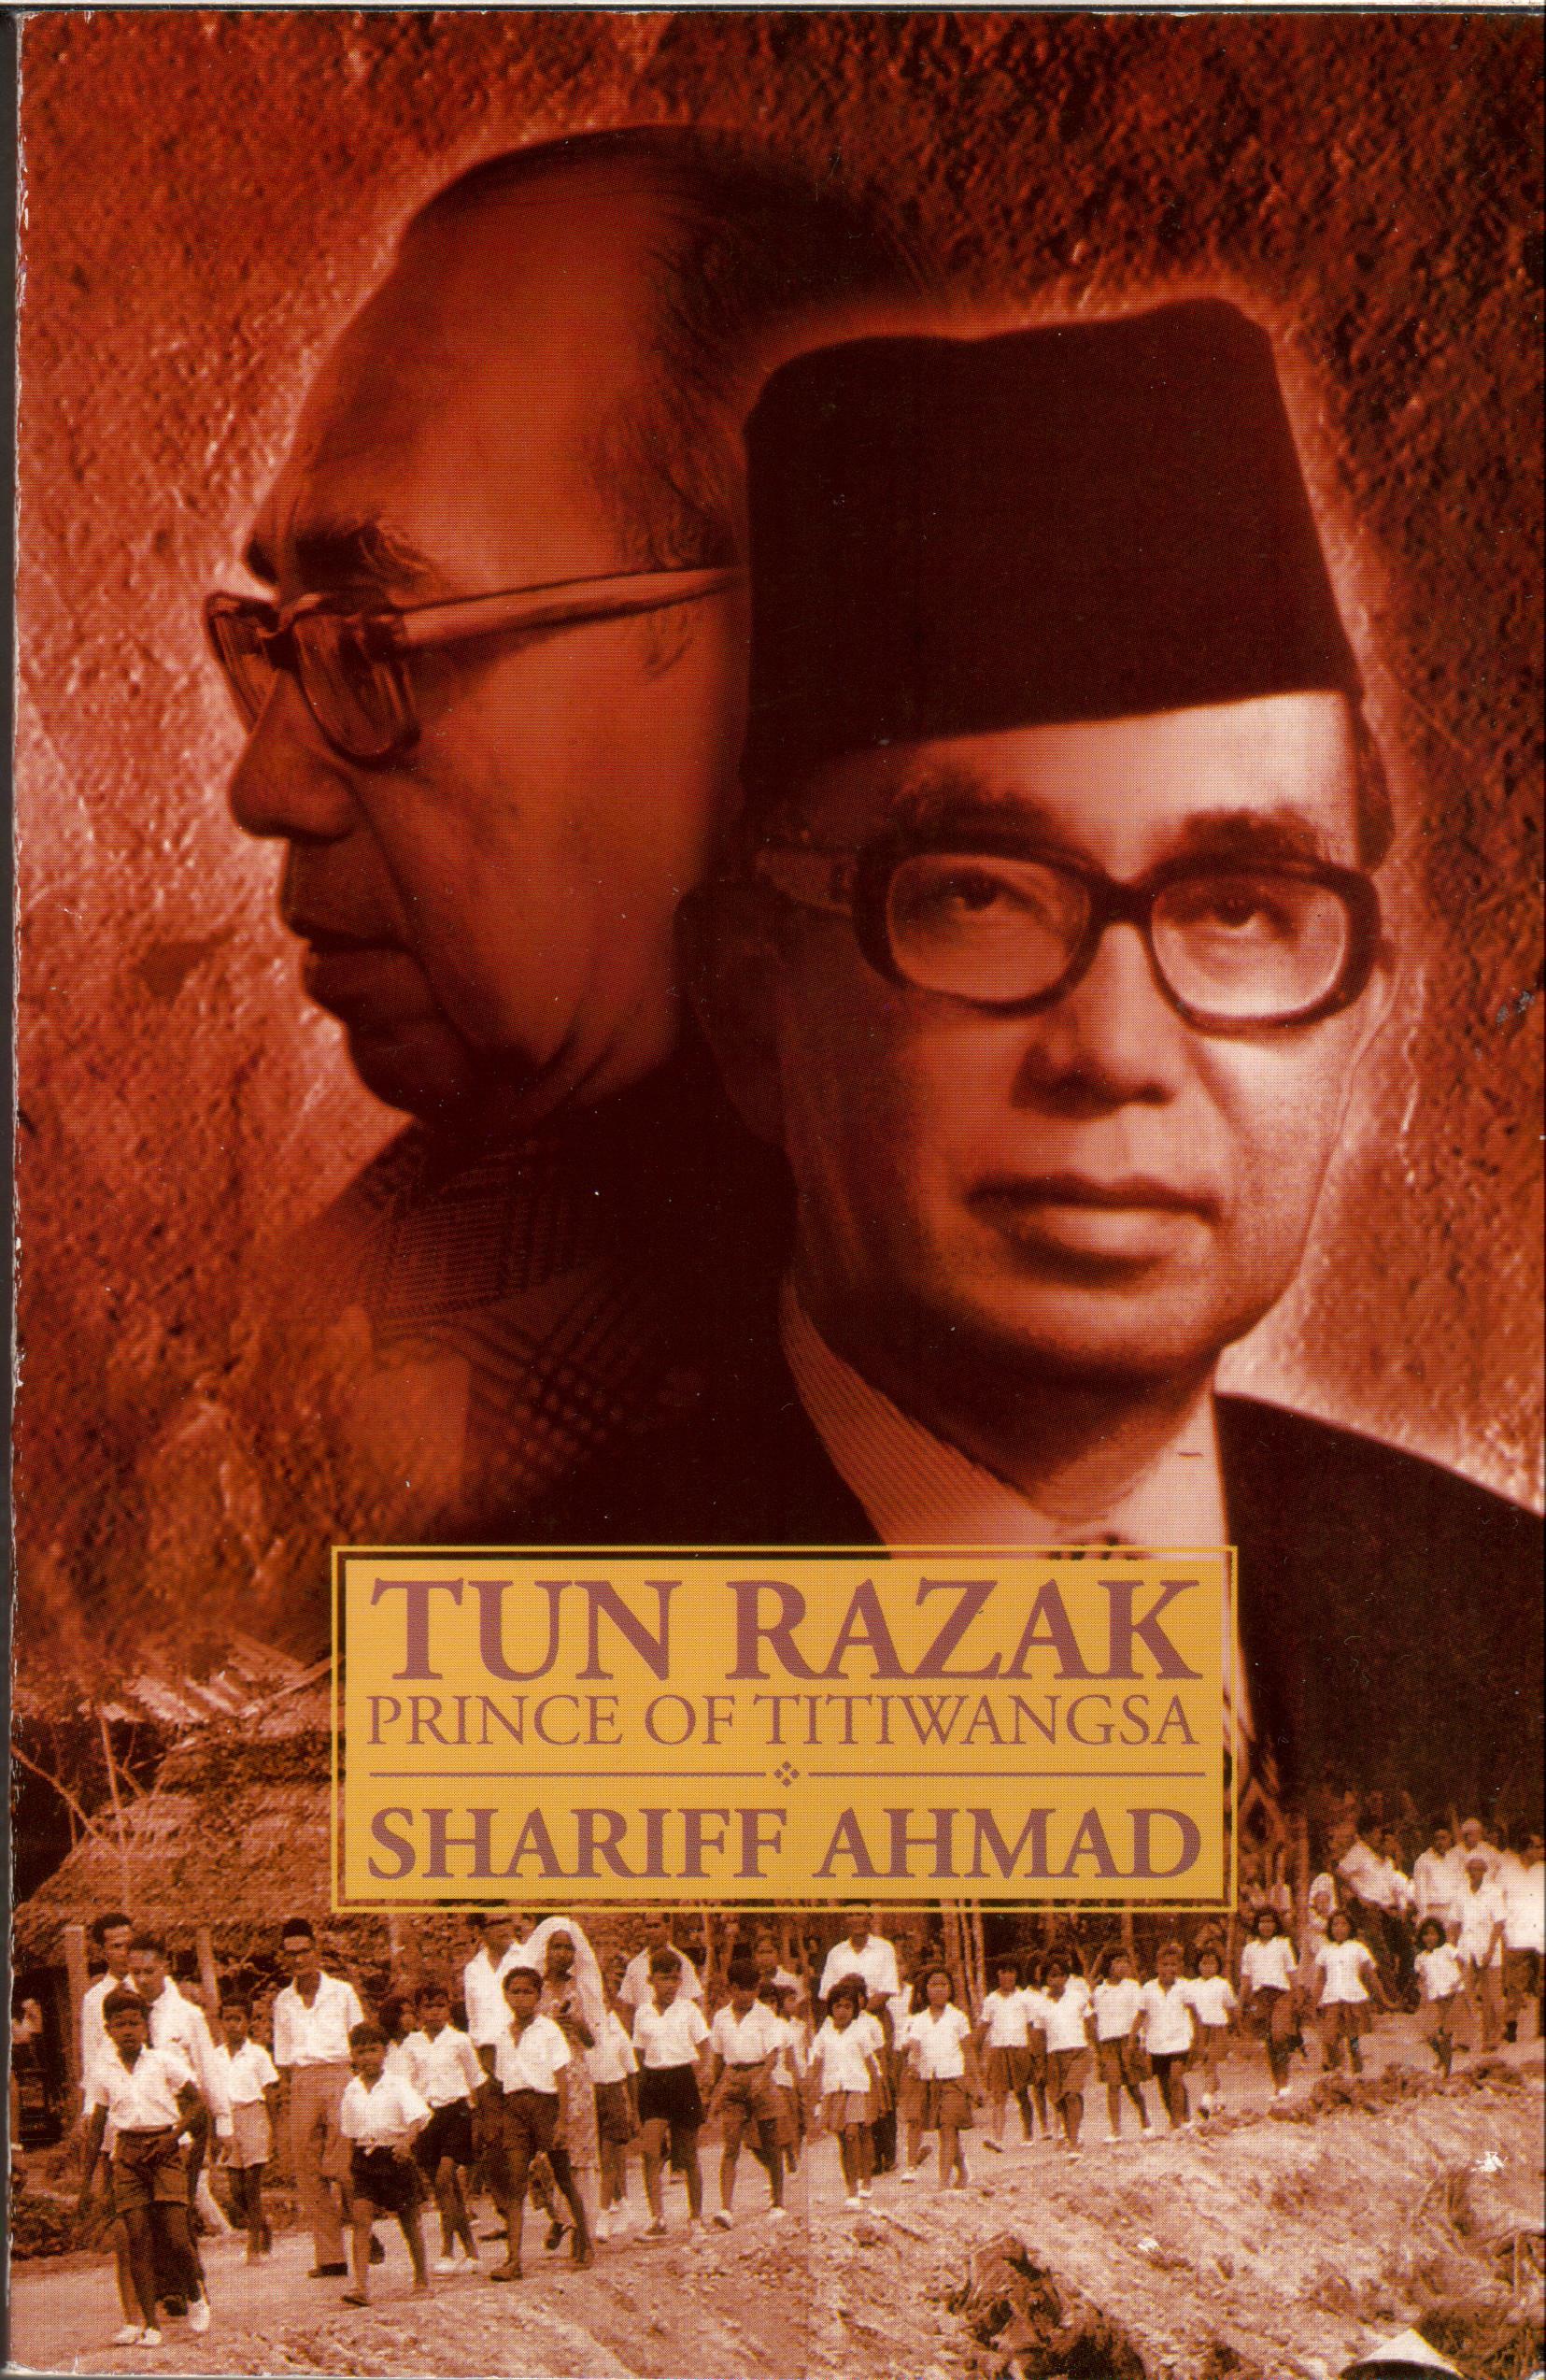 Tun Razak: Prince of Titiwangsa  by  Shariff Ahmad